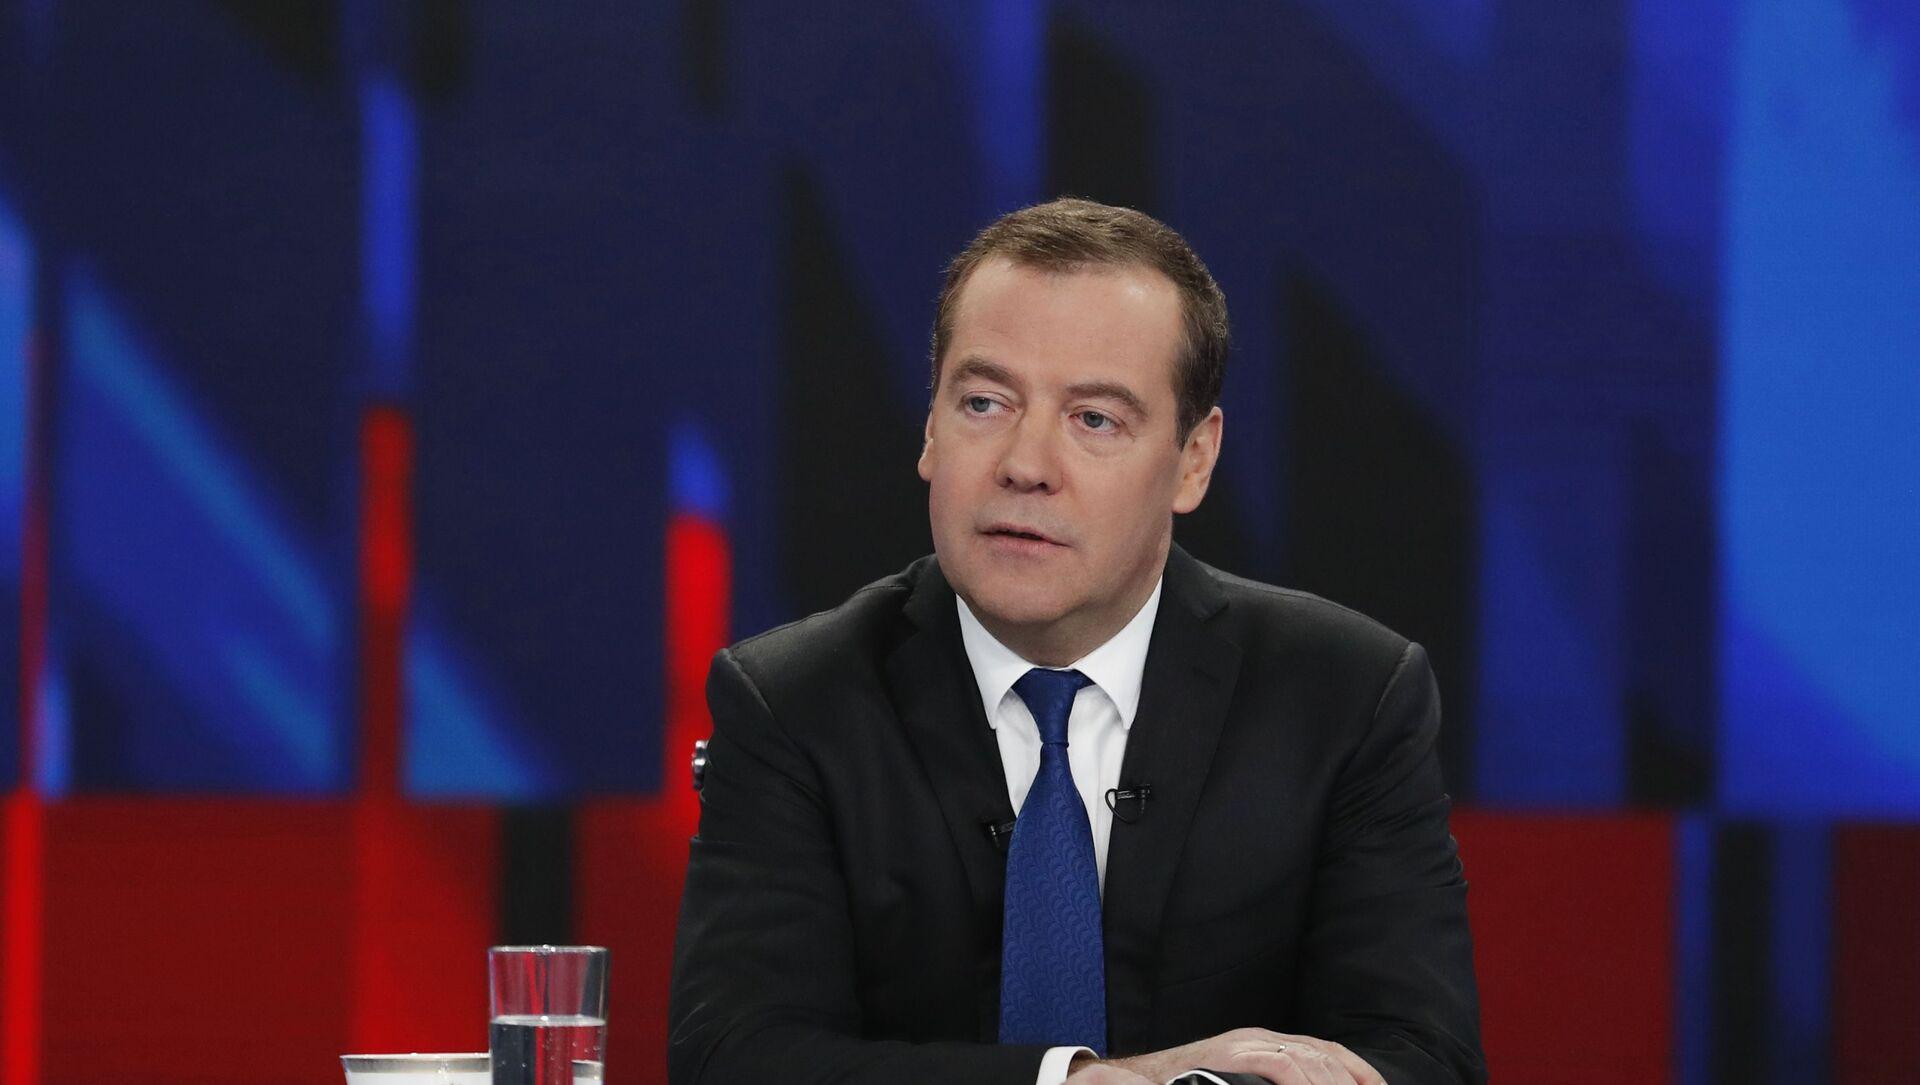 Дмитриј Медведев - Sputnik Србија, 1920, 23.04.2021